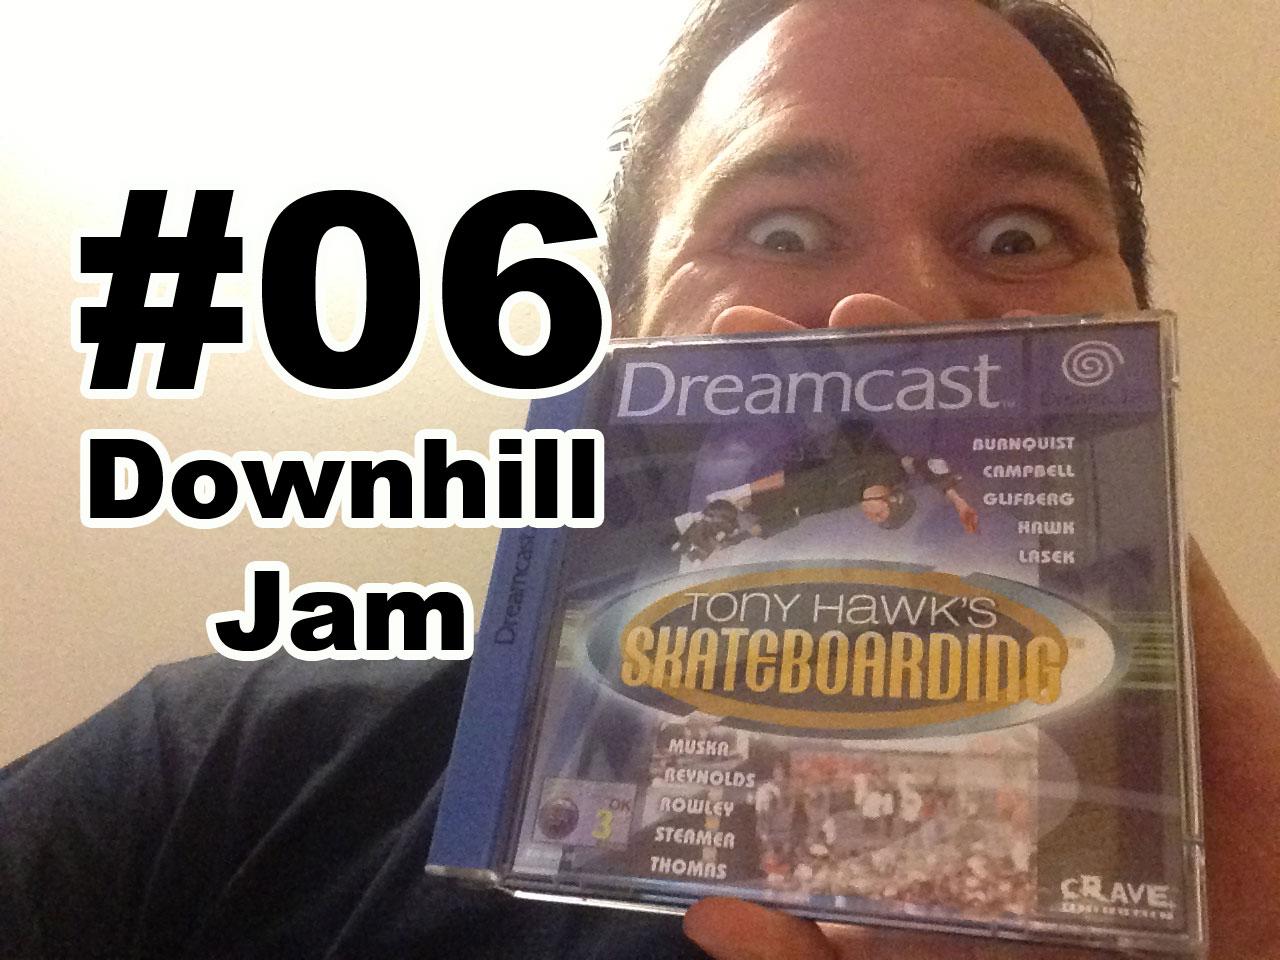 06_dowhill_jam